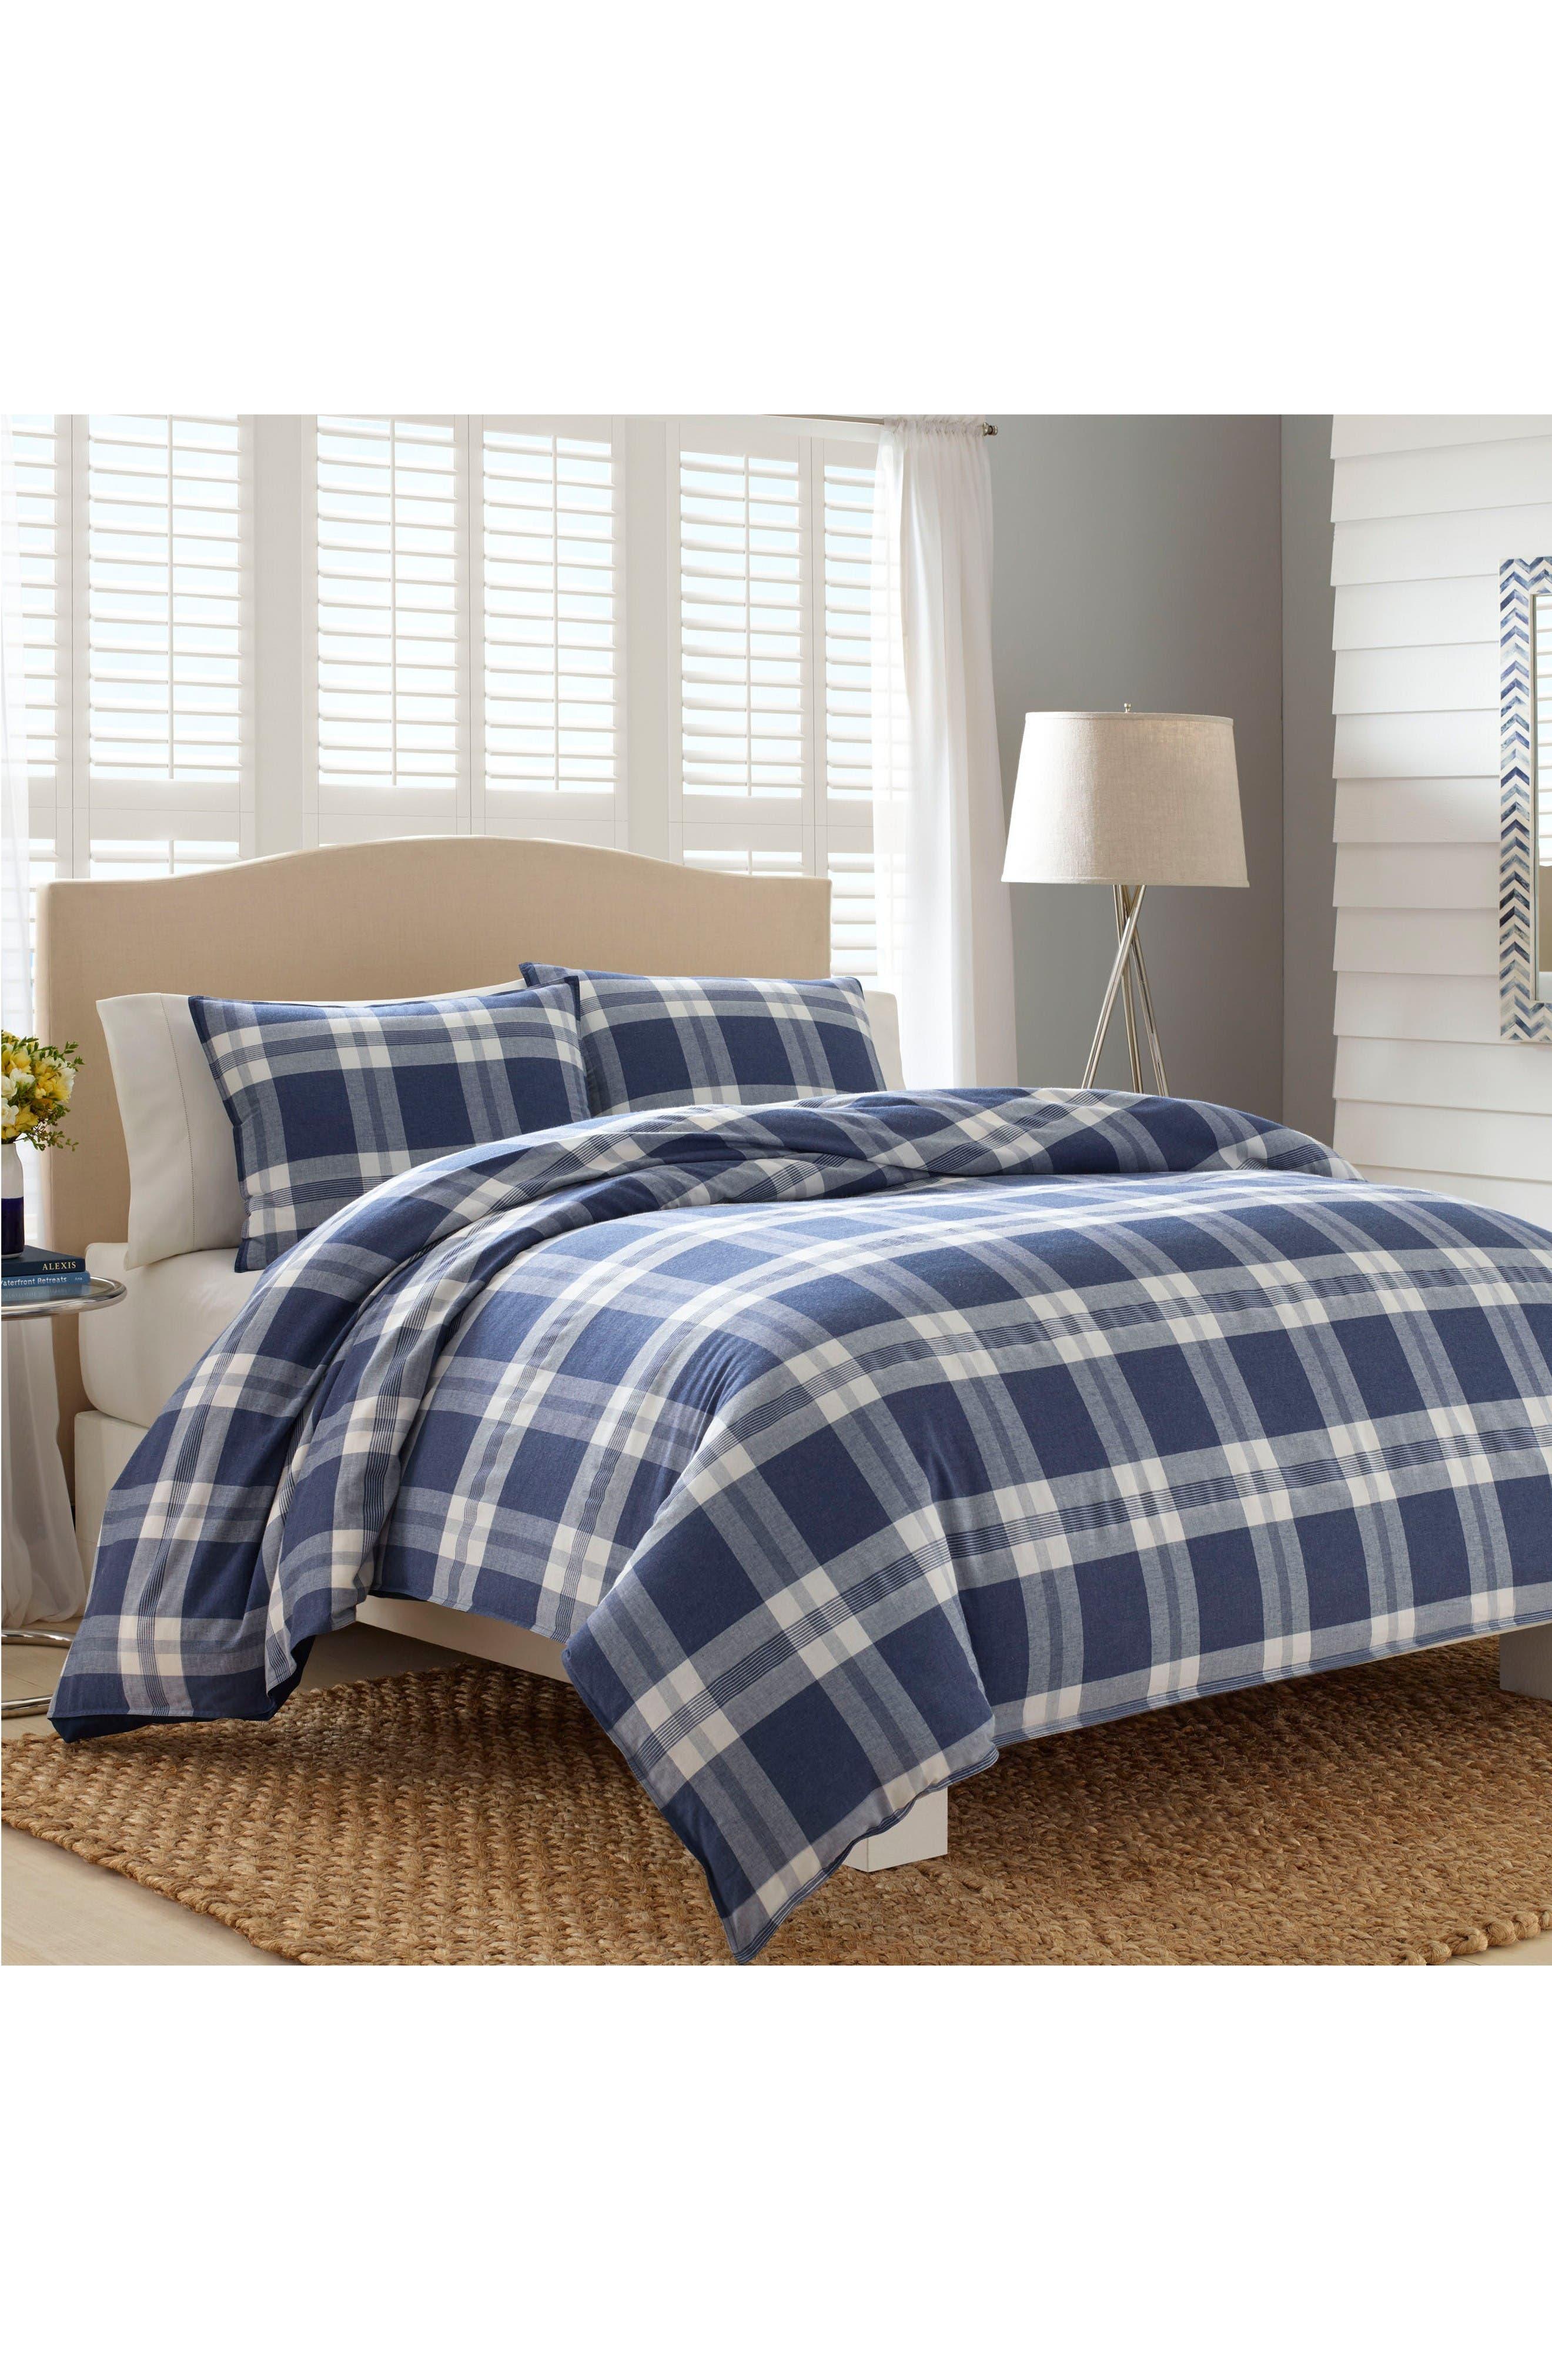 Alternate Image 1 Selected - Nautica Cunningham Comforter & Sham Set